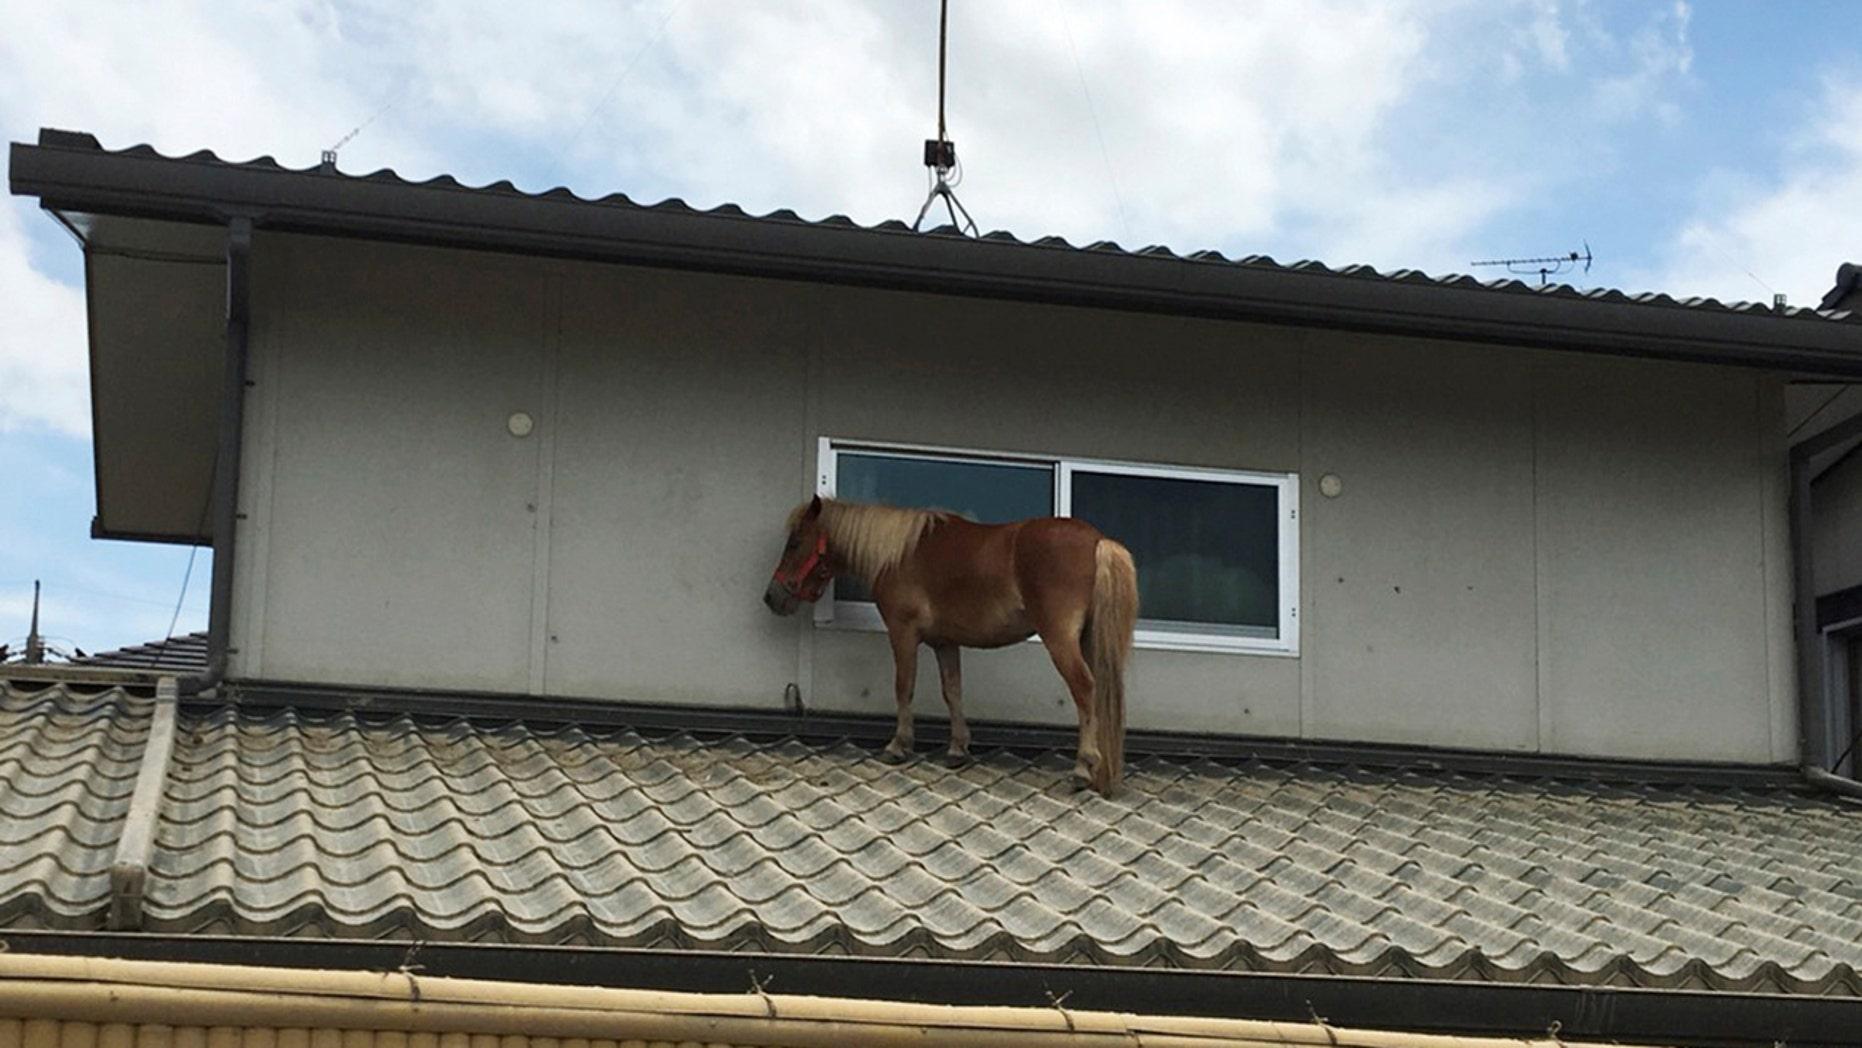 A horse ended up stranded on a rooftop after torrential rain in Kurashiki, Japan.